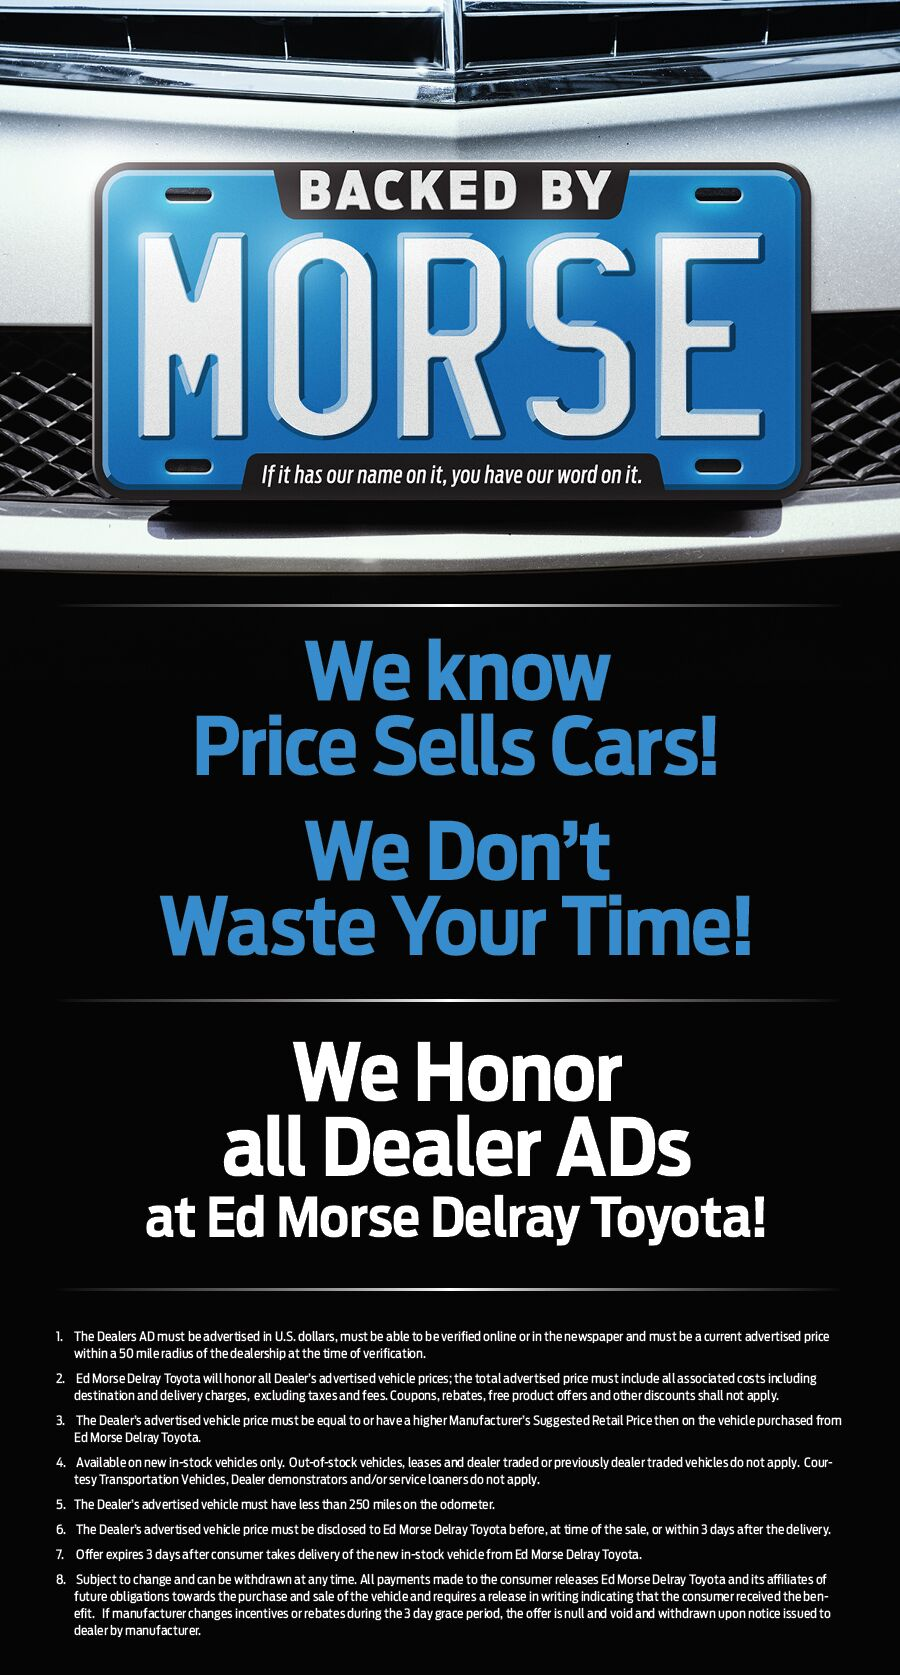 Delightful Email Ed Morse Delray Toyota